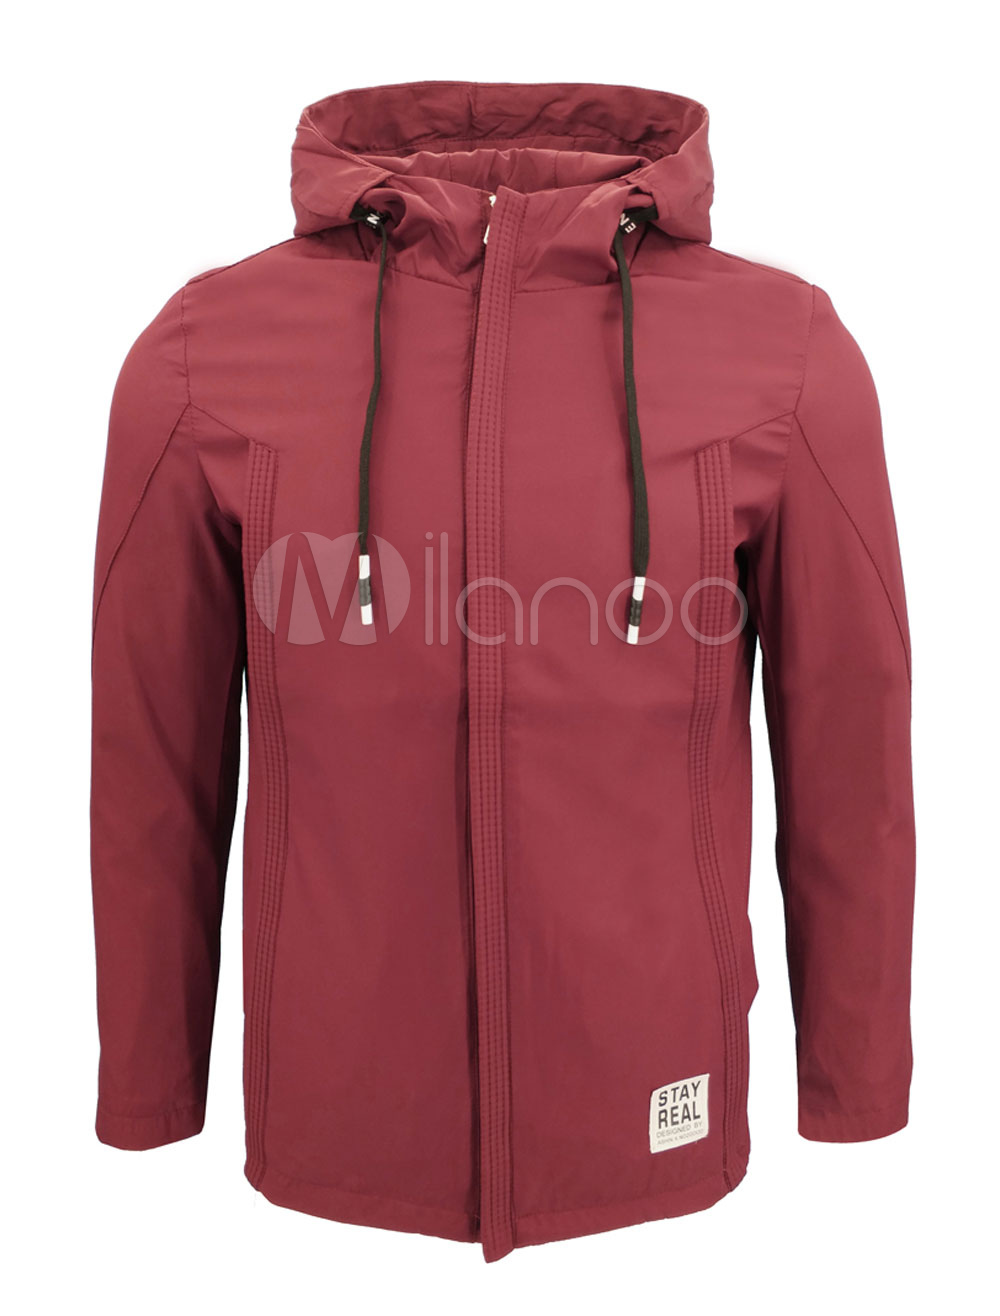 Black Men Jacket Spring Jacket Long Sleeve Zip Up Hooded Jacket thumbnail